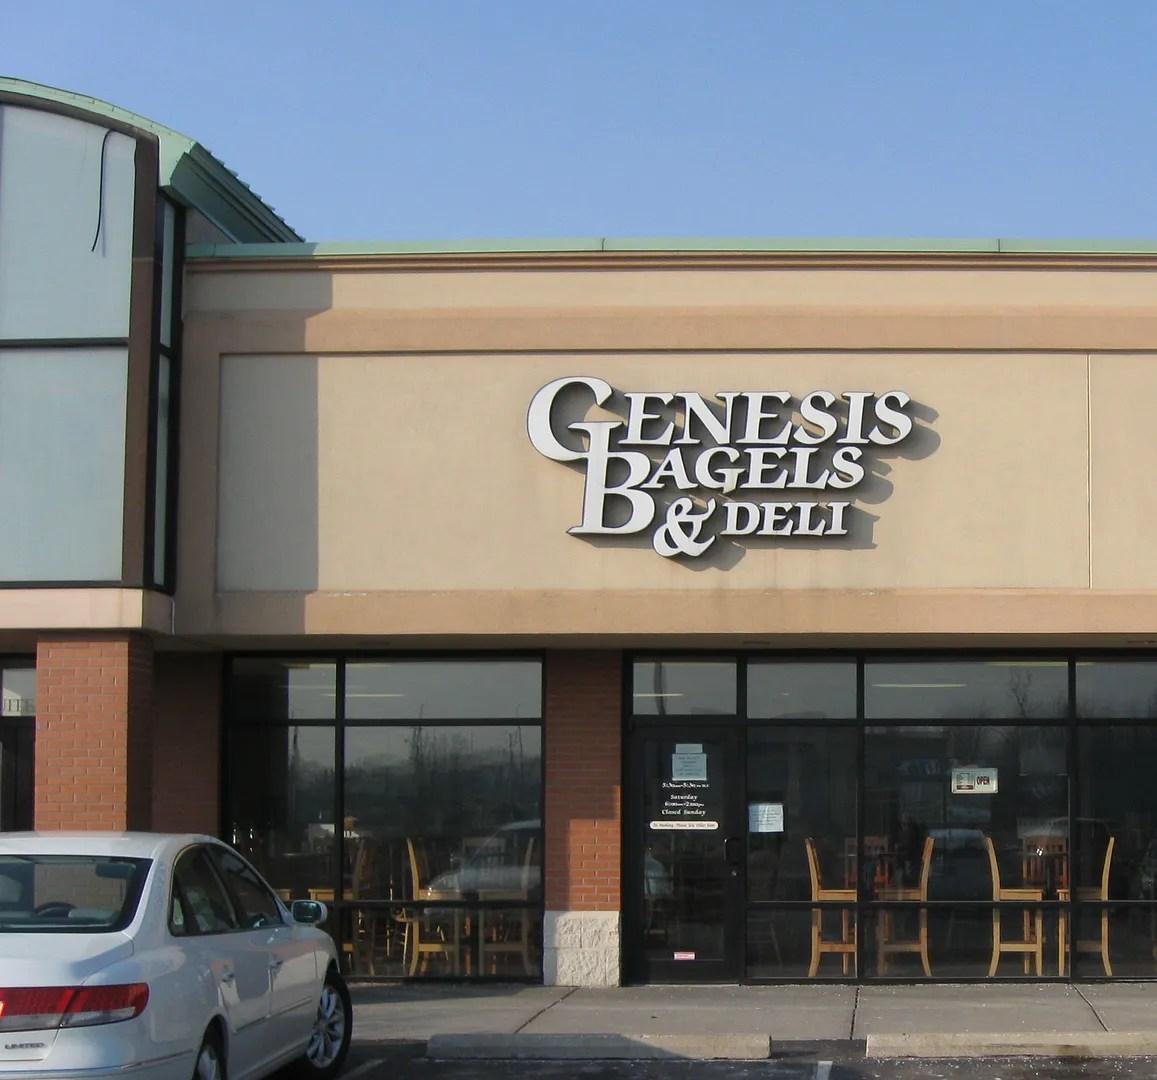 Genesis Bagels & Deli